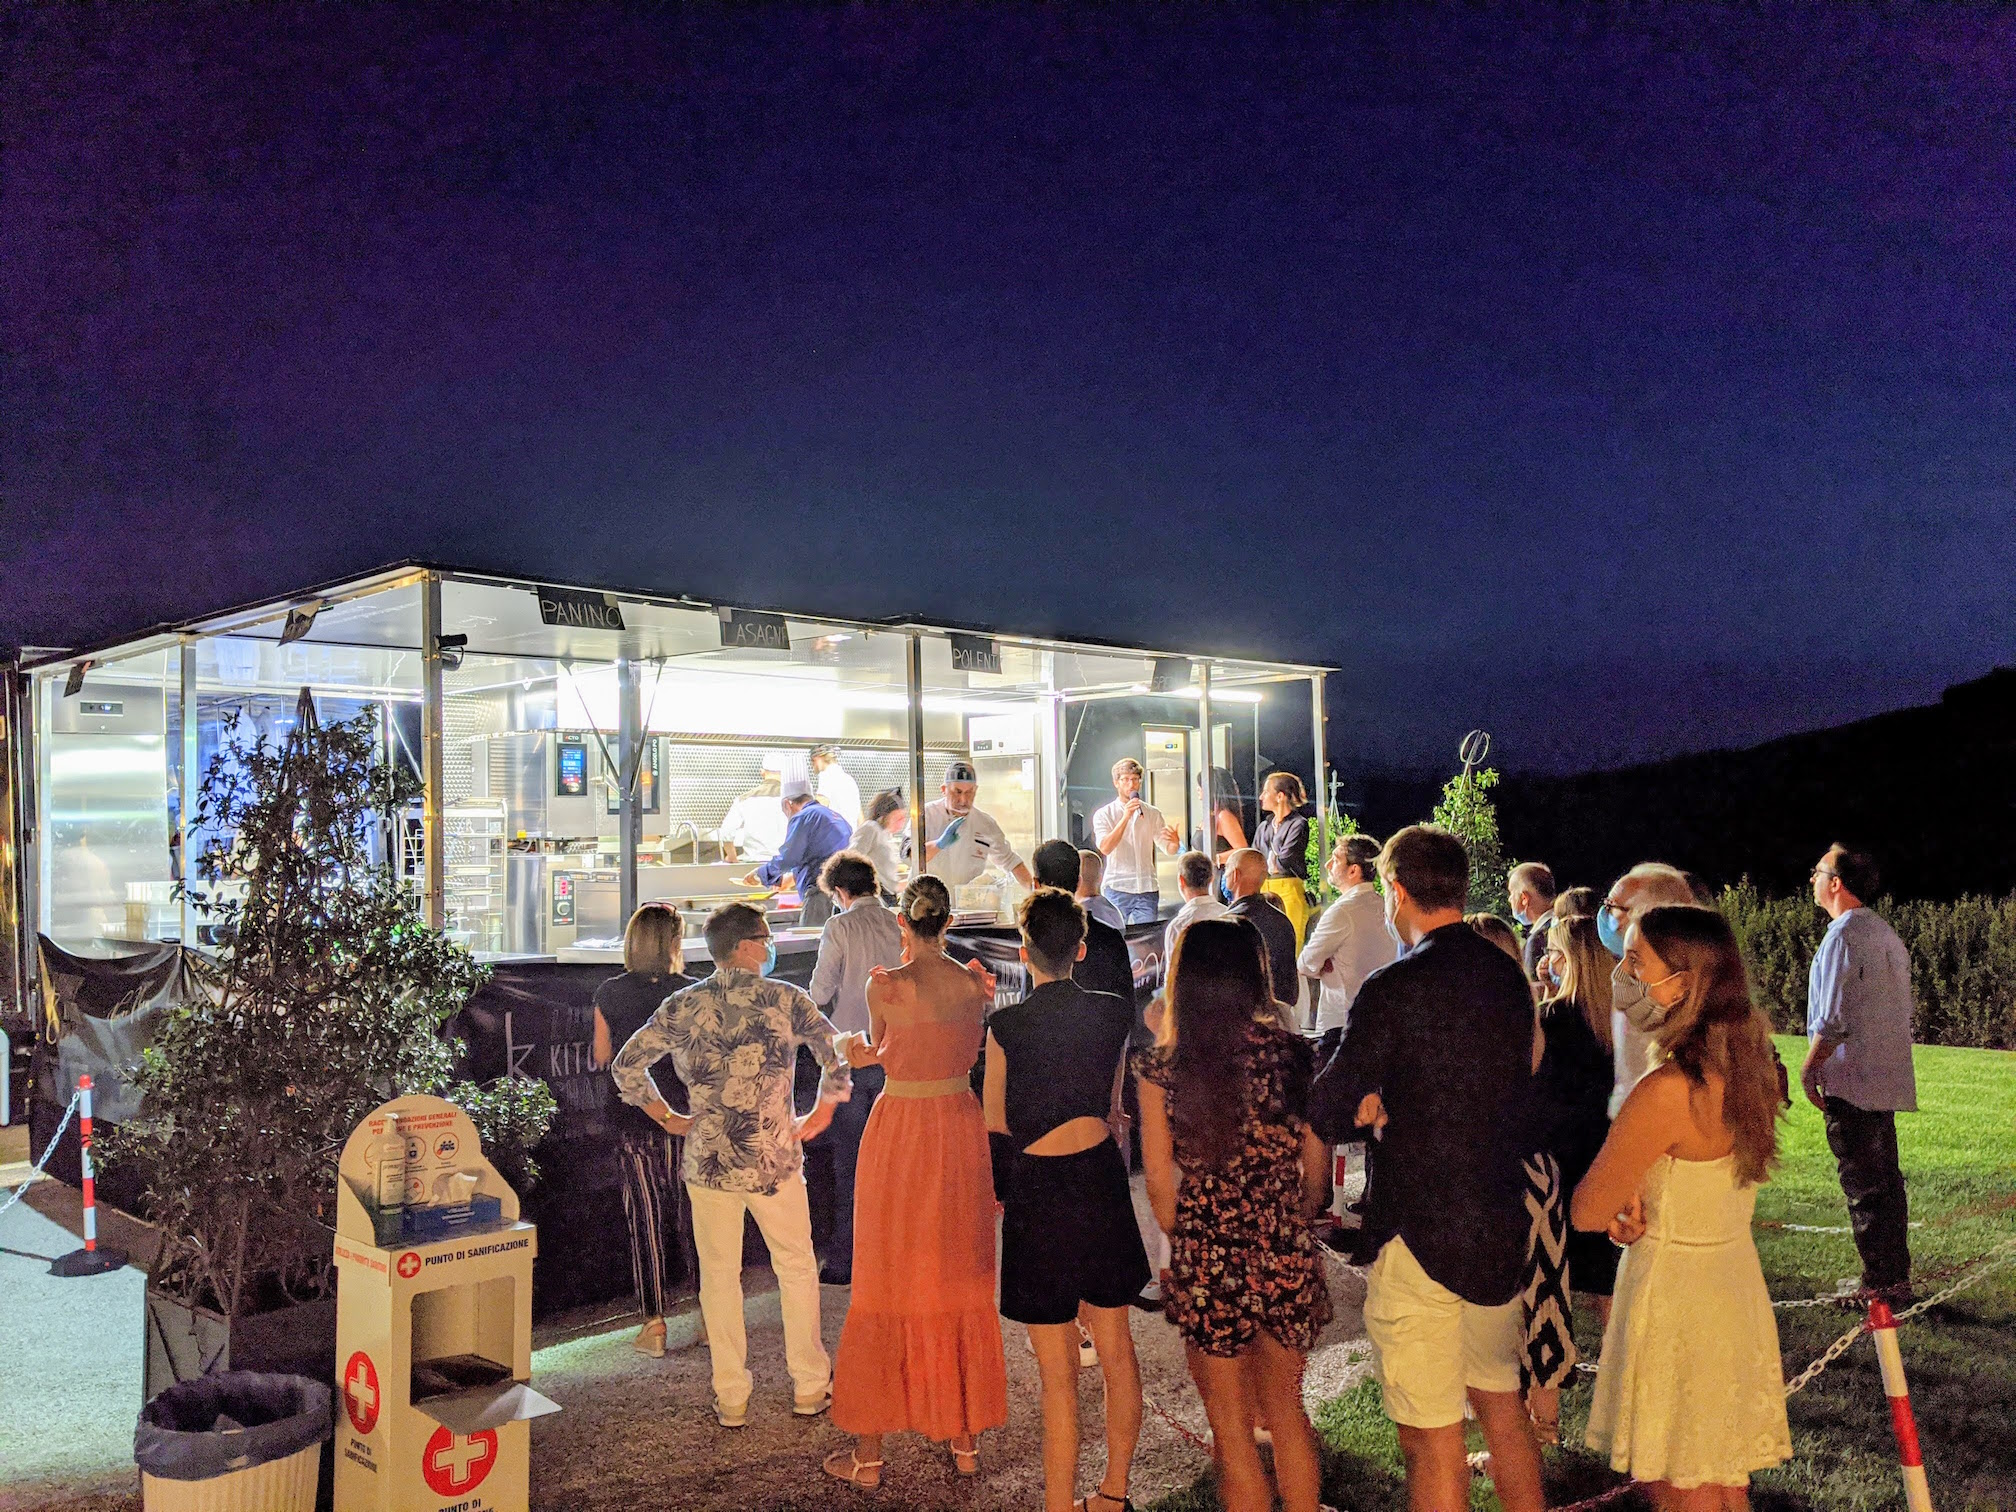 Cucina mobile per eventi